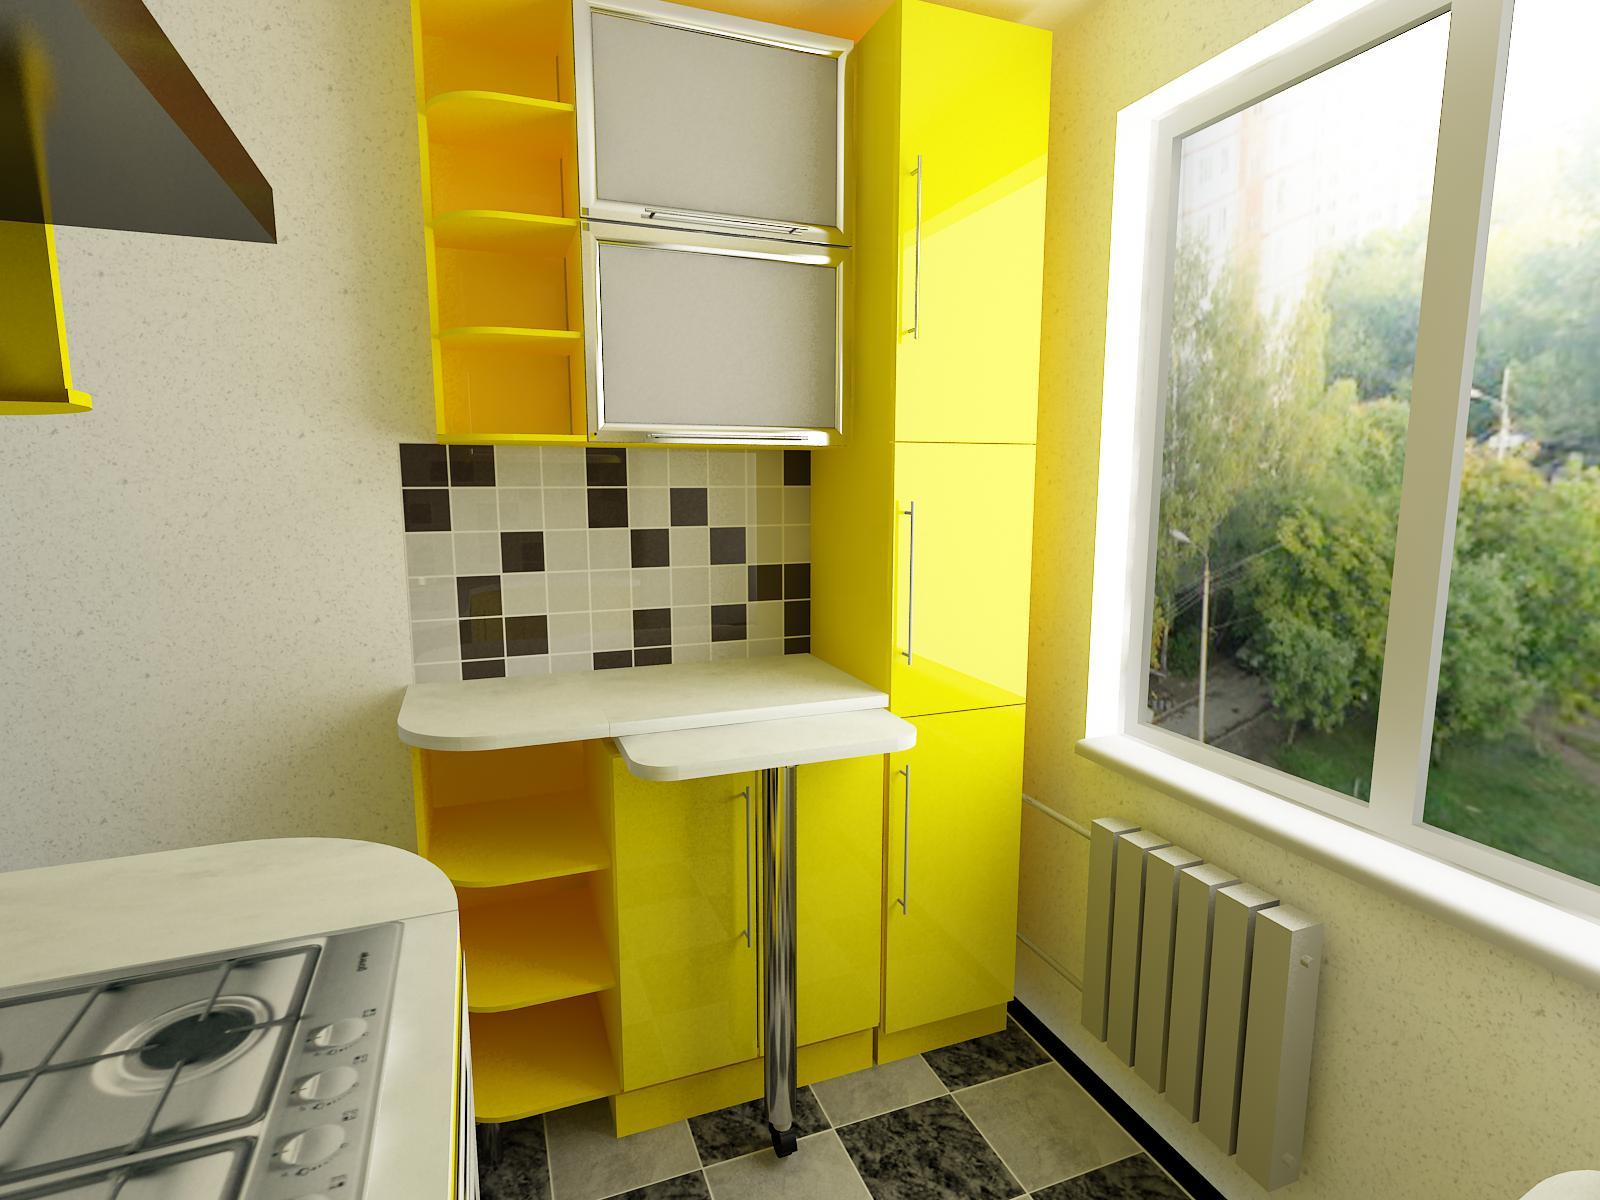 Кухня 5 кв.м. дизайн фото